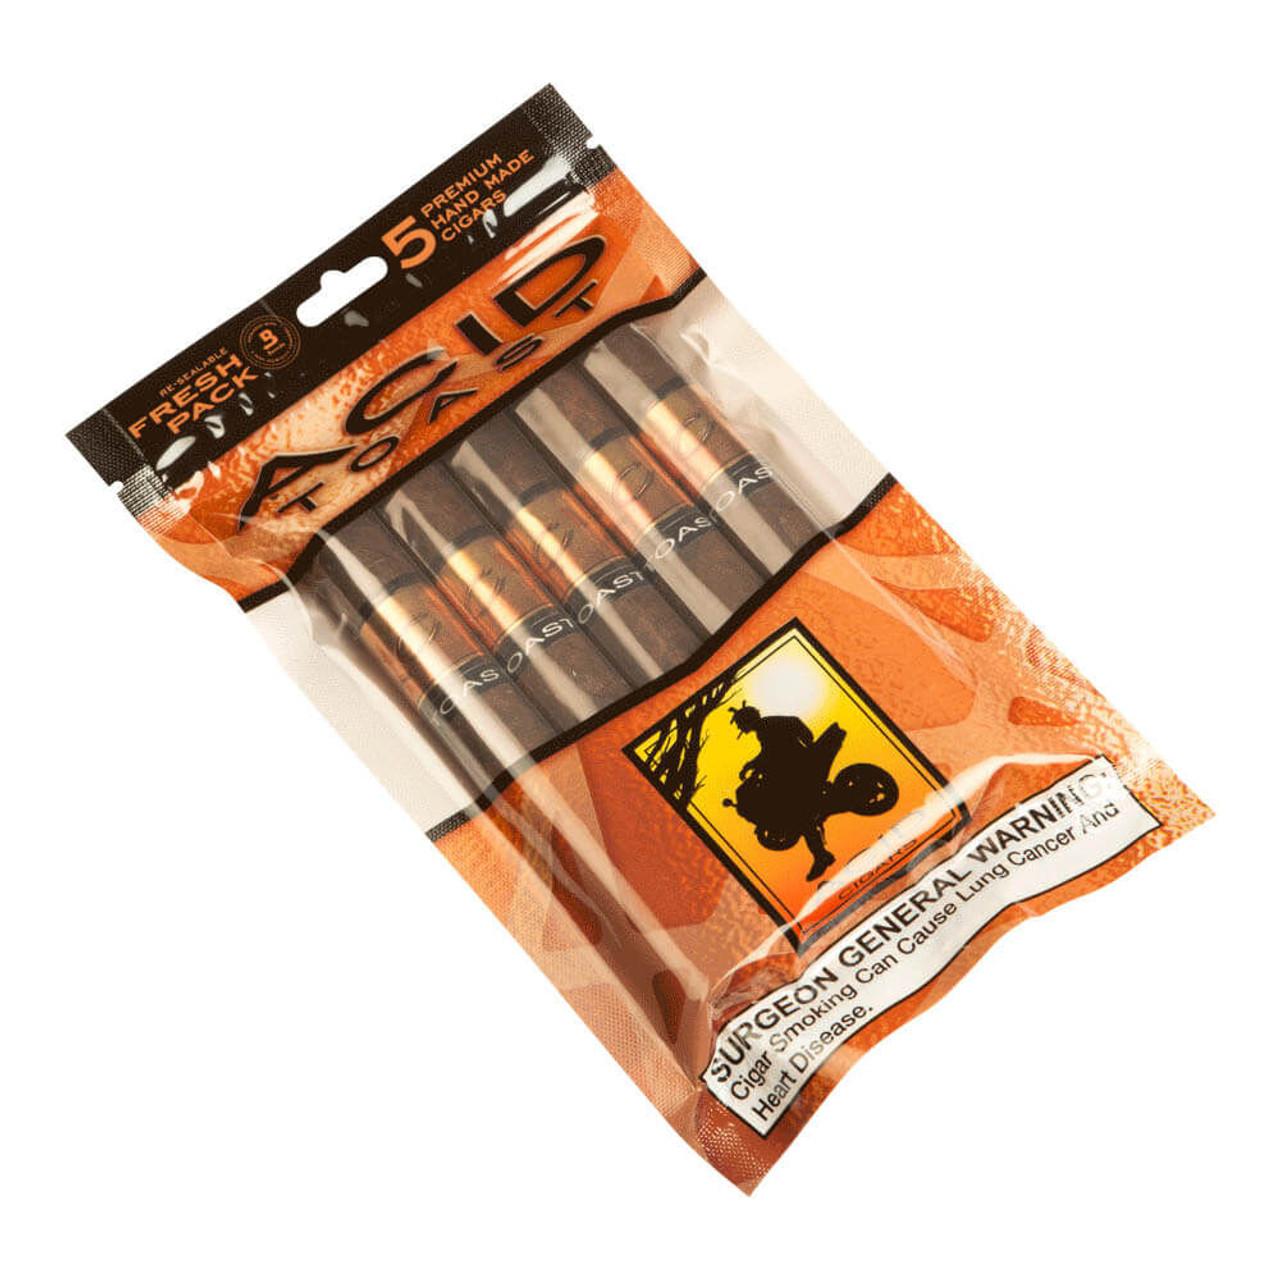 Acid Gold Toast 5/5 Fresh Seal Packs Cigars - 6 x 50 (5 Packs of 5 (25 total))